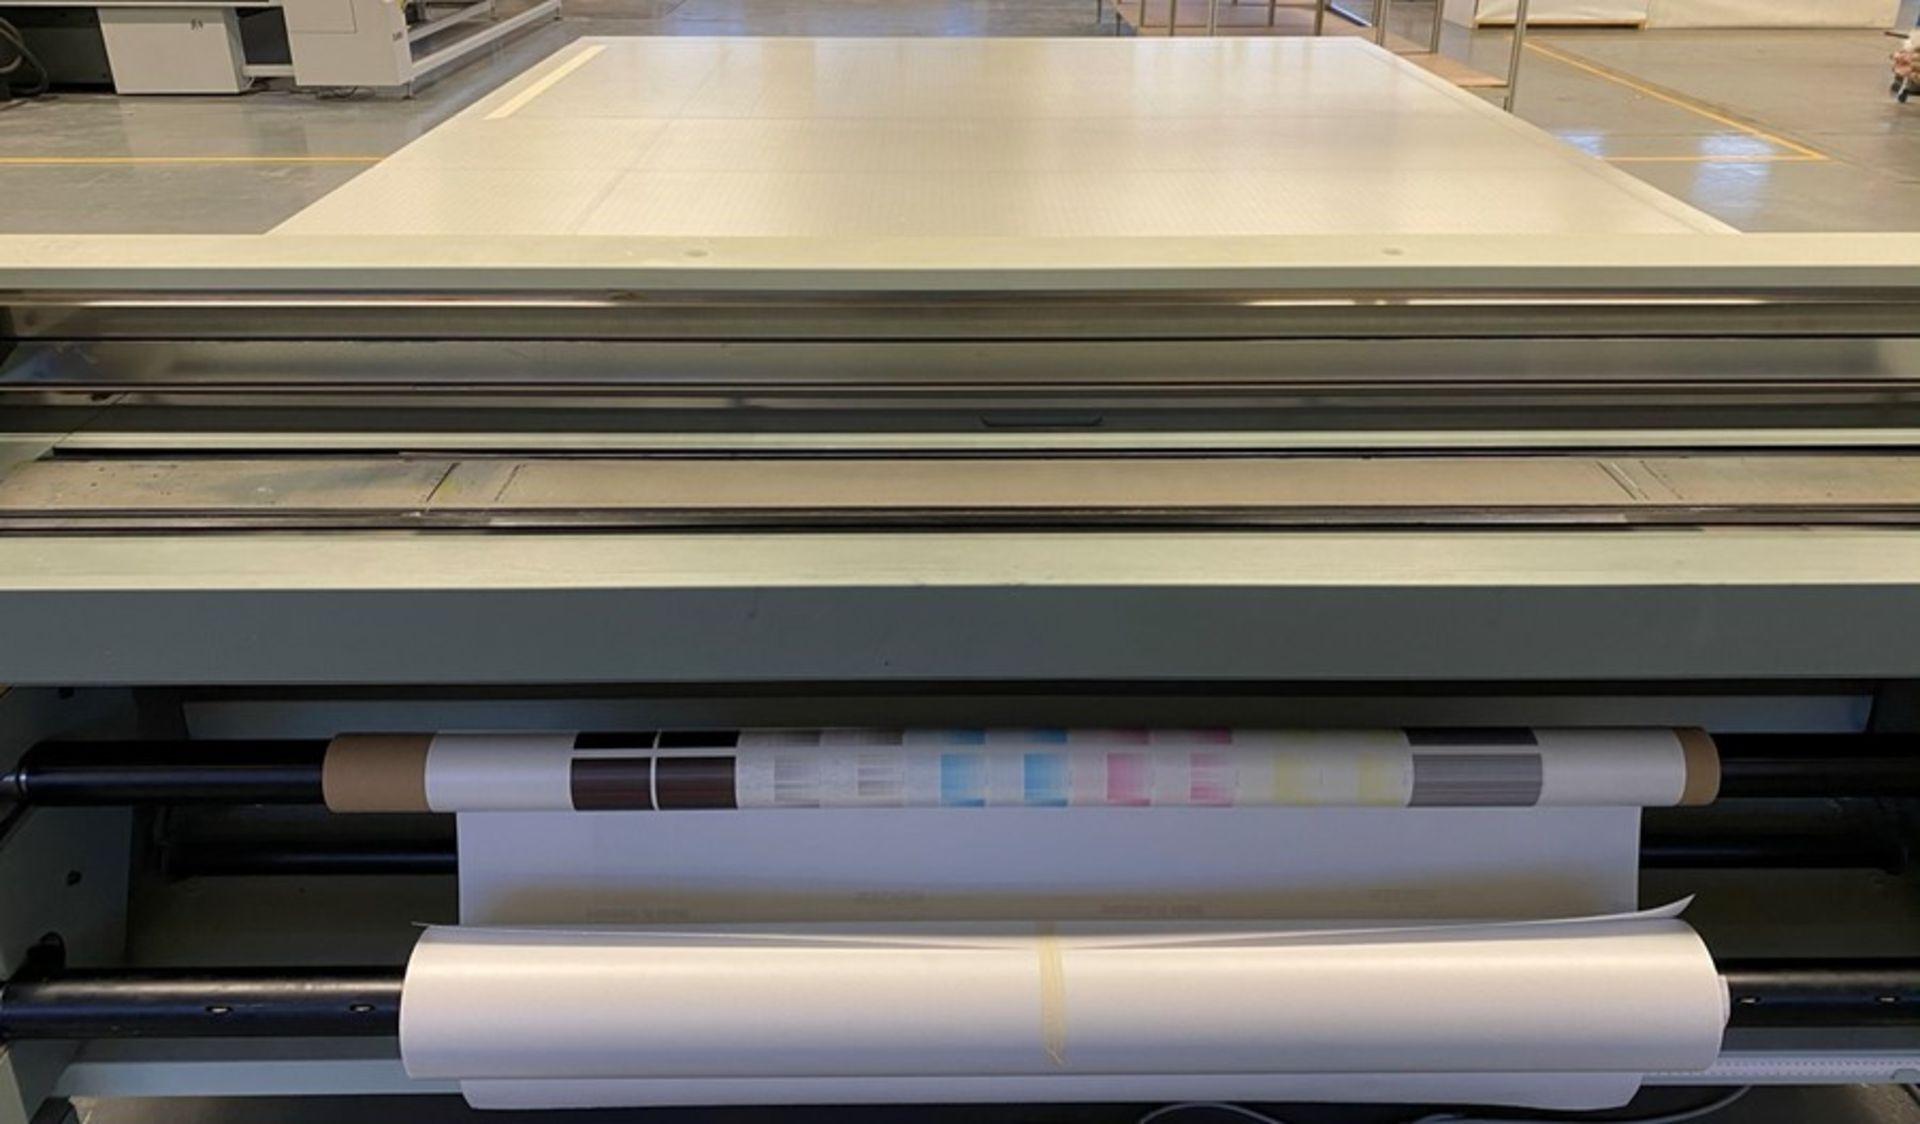 Oce Arizona 550XT + WIO UV flatbed printer (2013) - Image 21 of 22